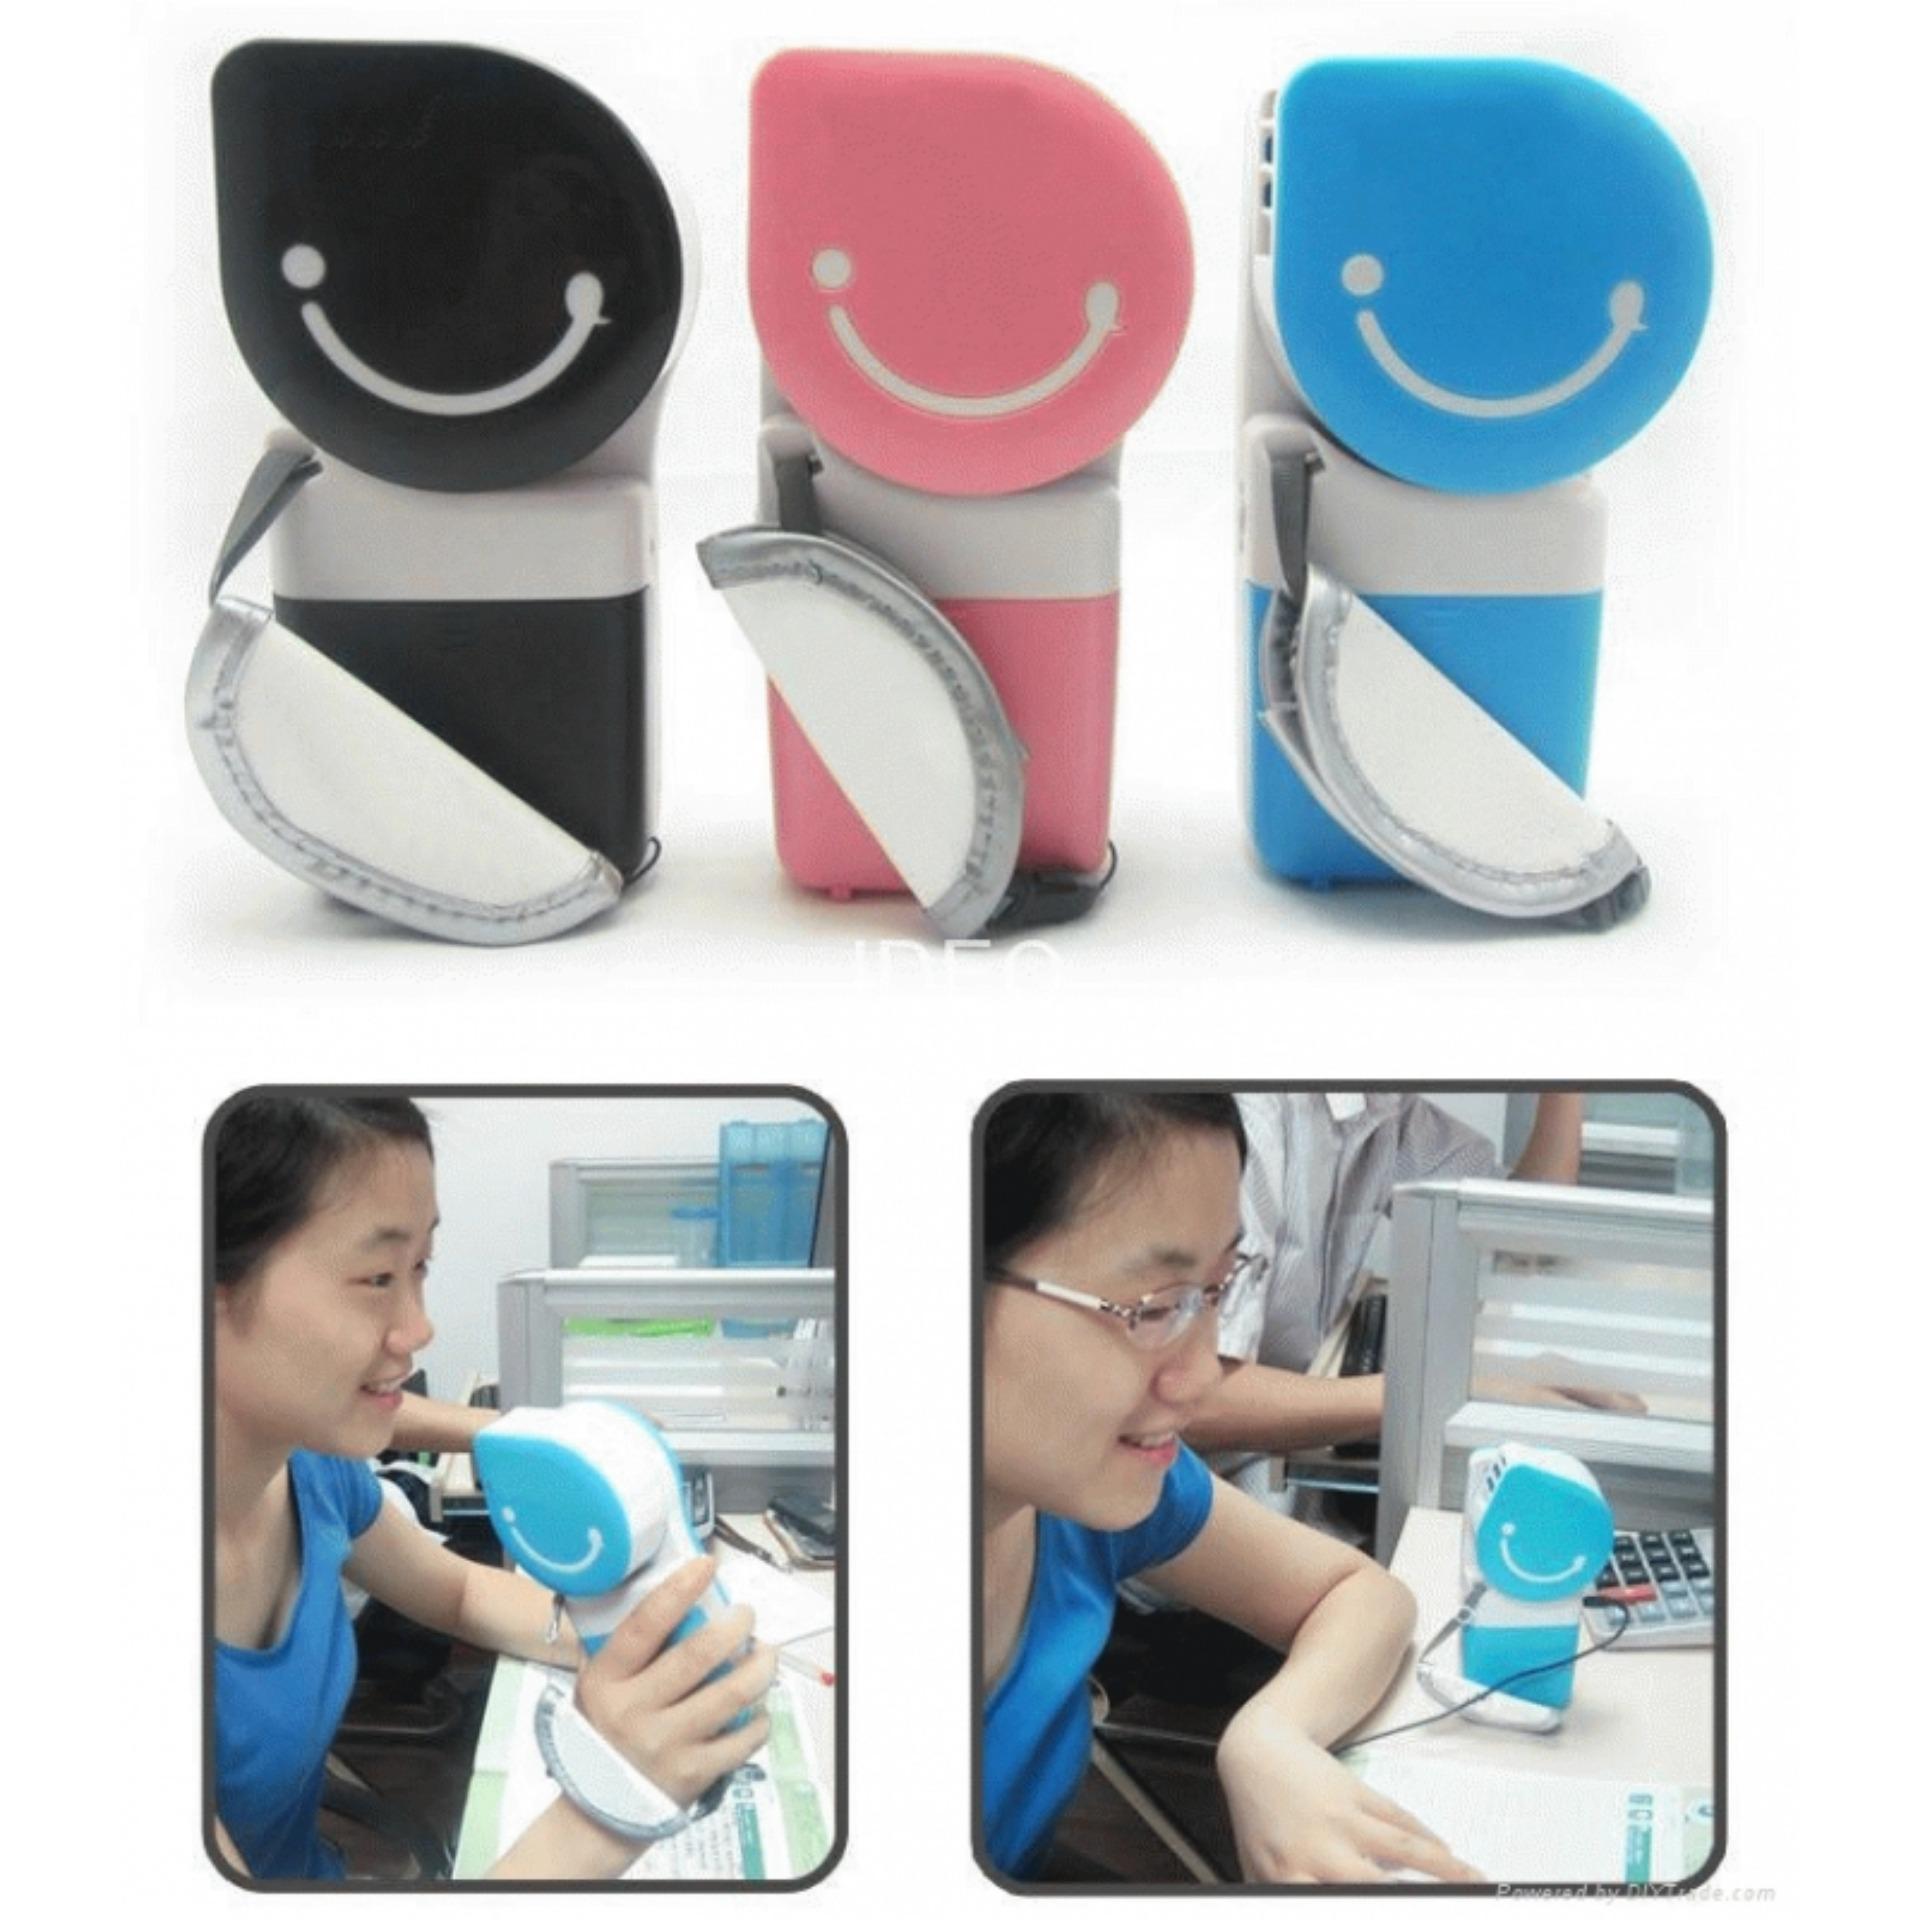 Universal Handheld Mini Portable Air Conditioner USB Fan - AC Genggam AC Tangan AC USB Kipas Angin Portable Cooler AC Murah